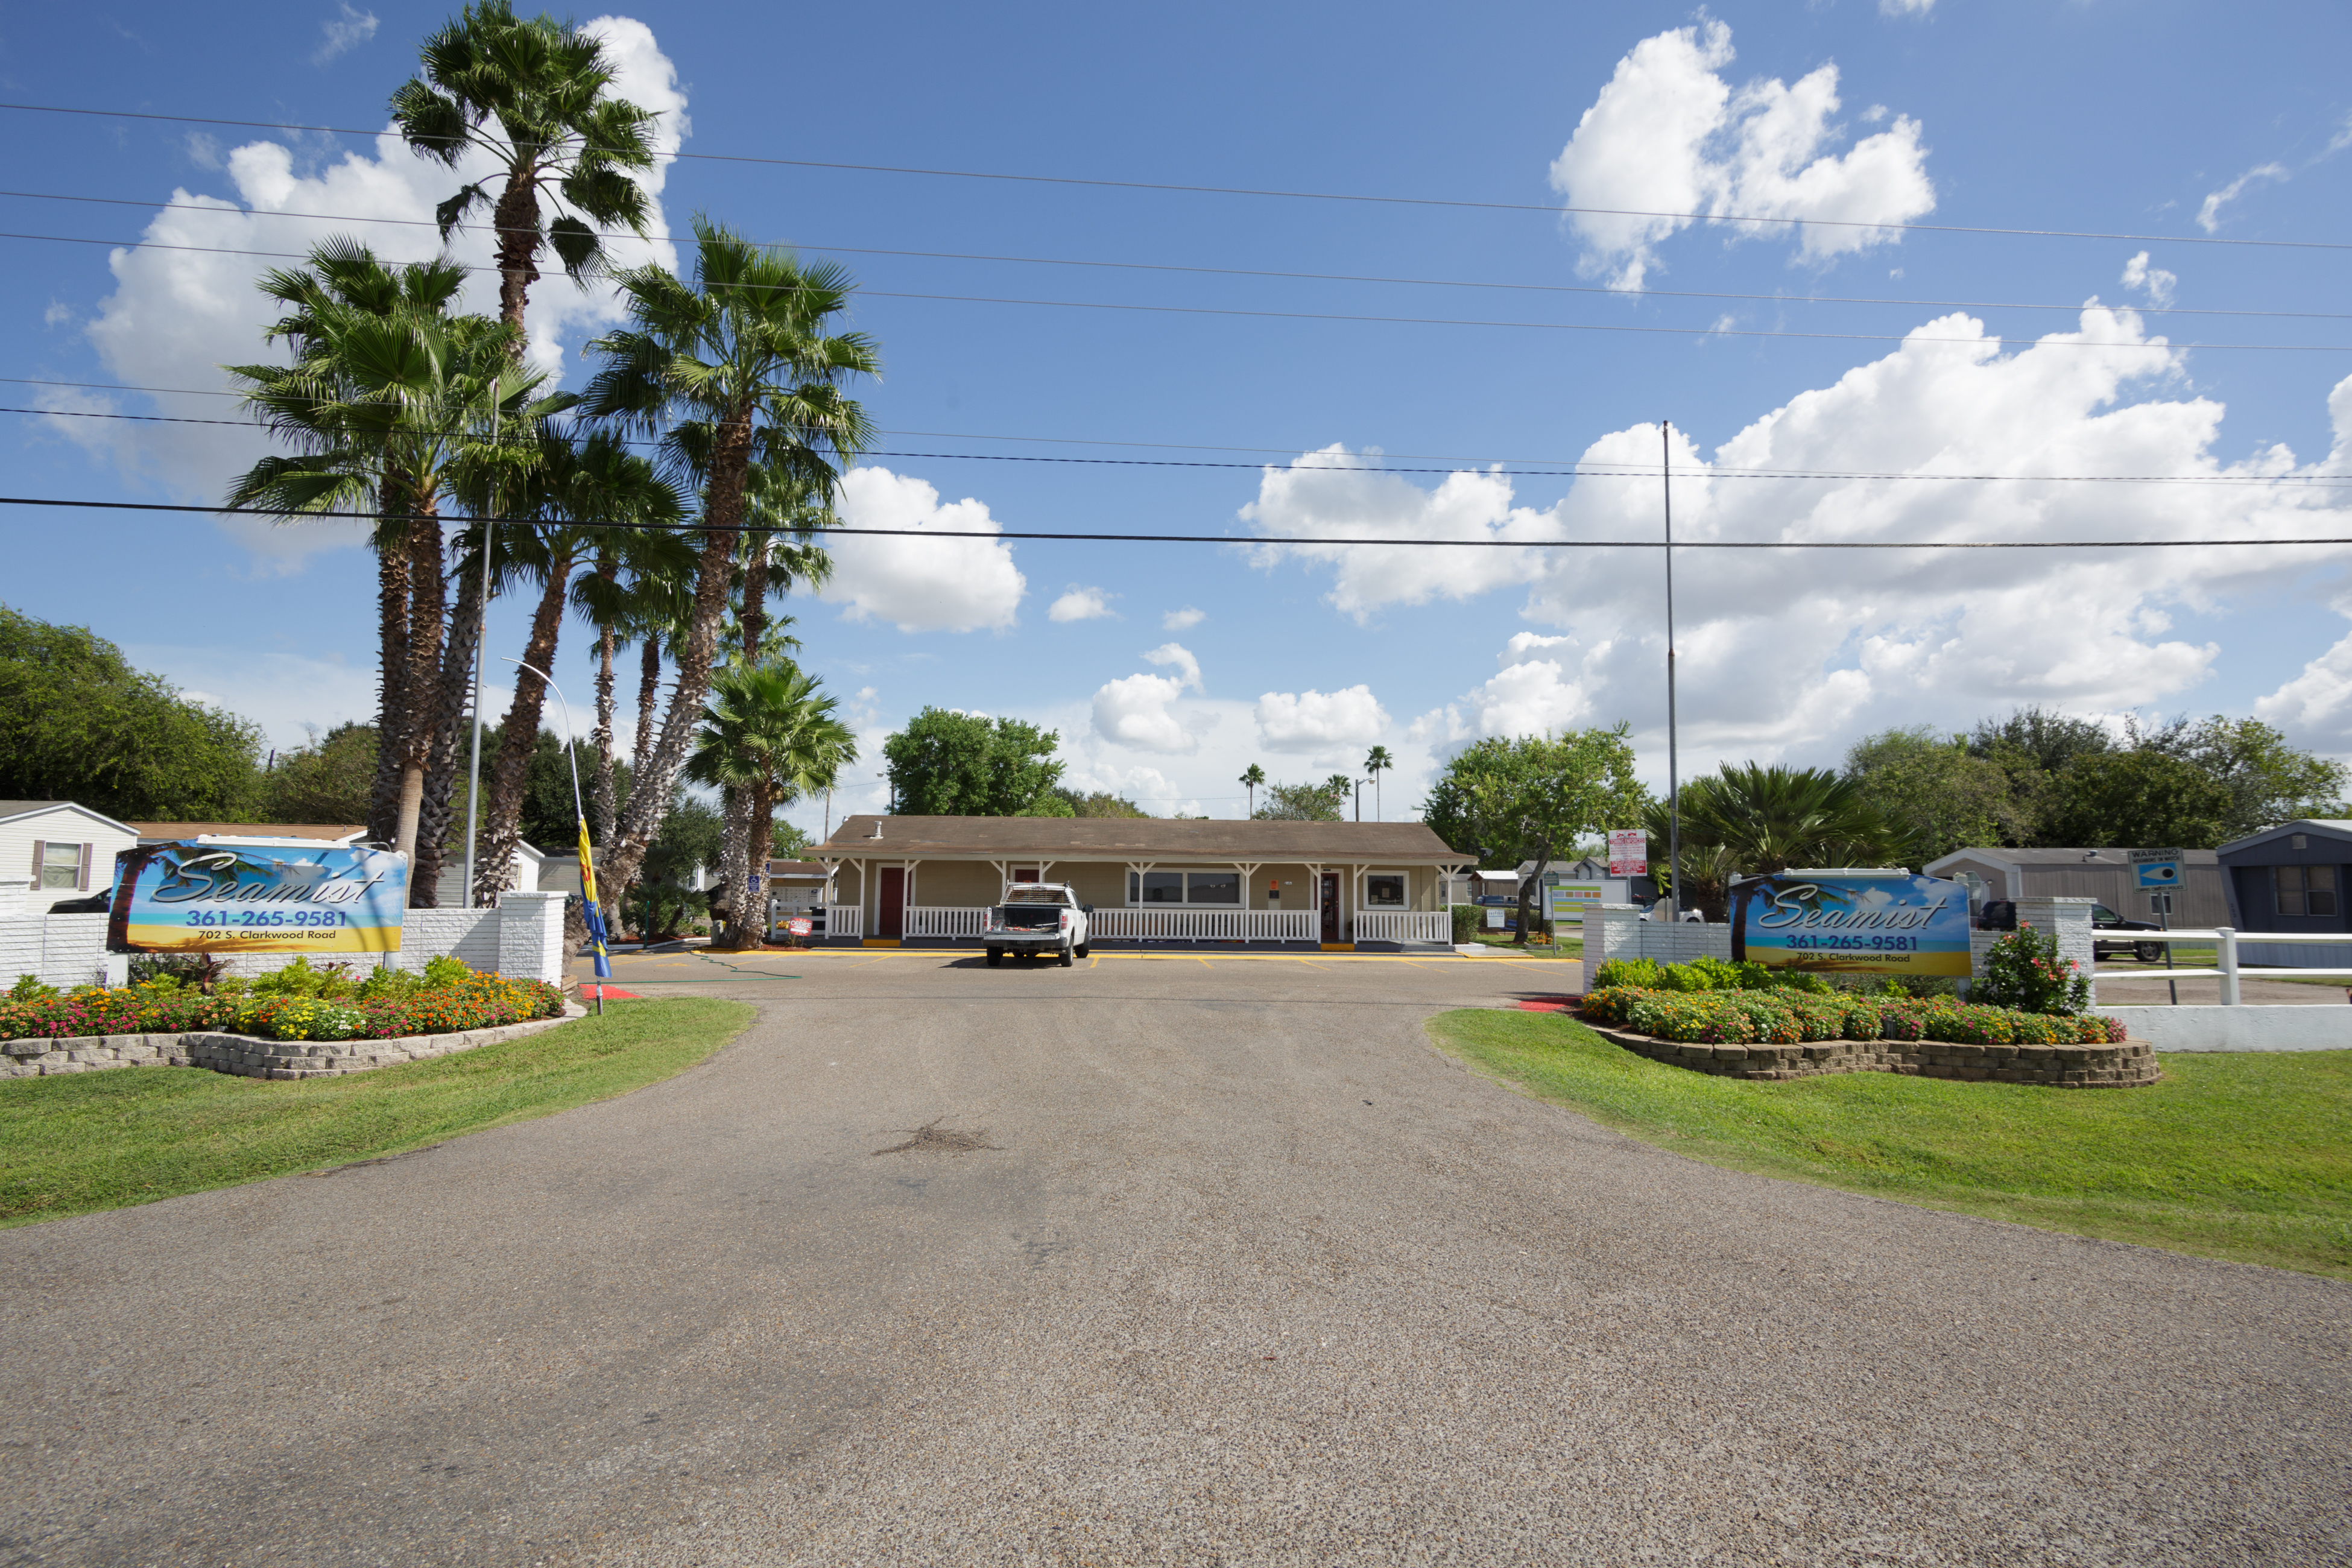 Seamist In Corpus Christi, Tx | Yes! Communities - Google Maps Street View Corpus Christi Texas